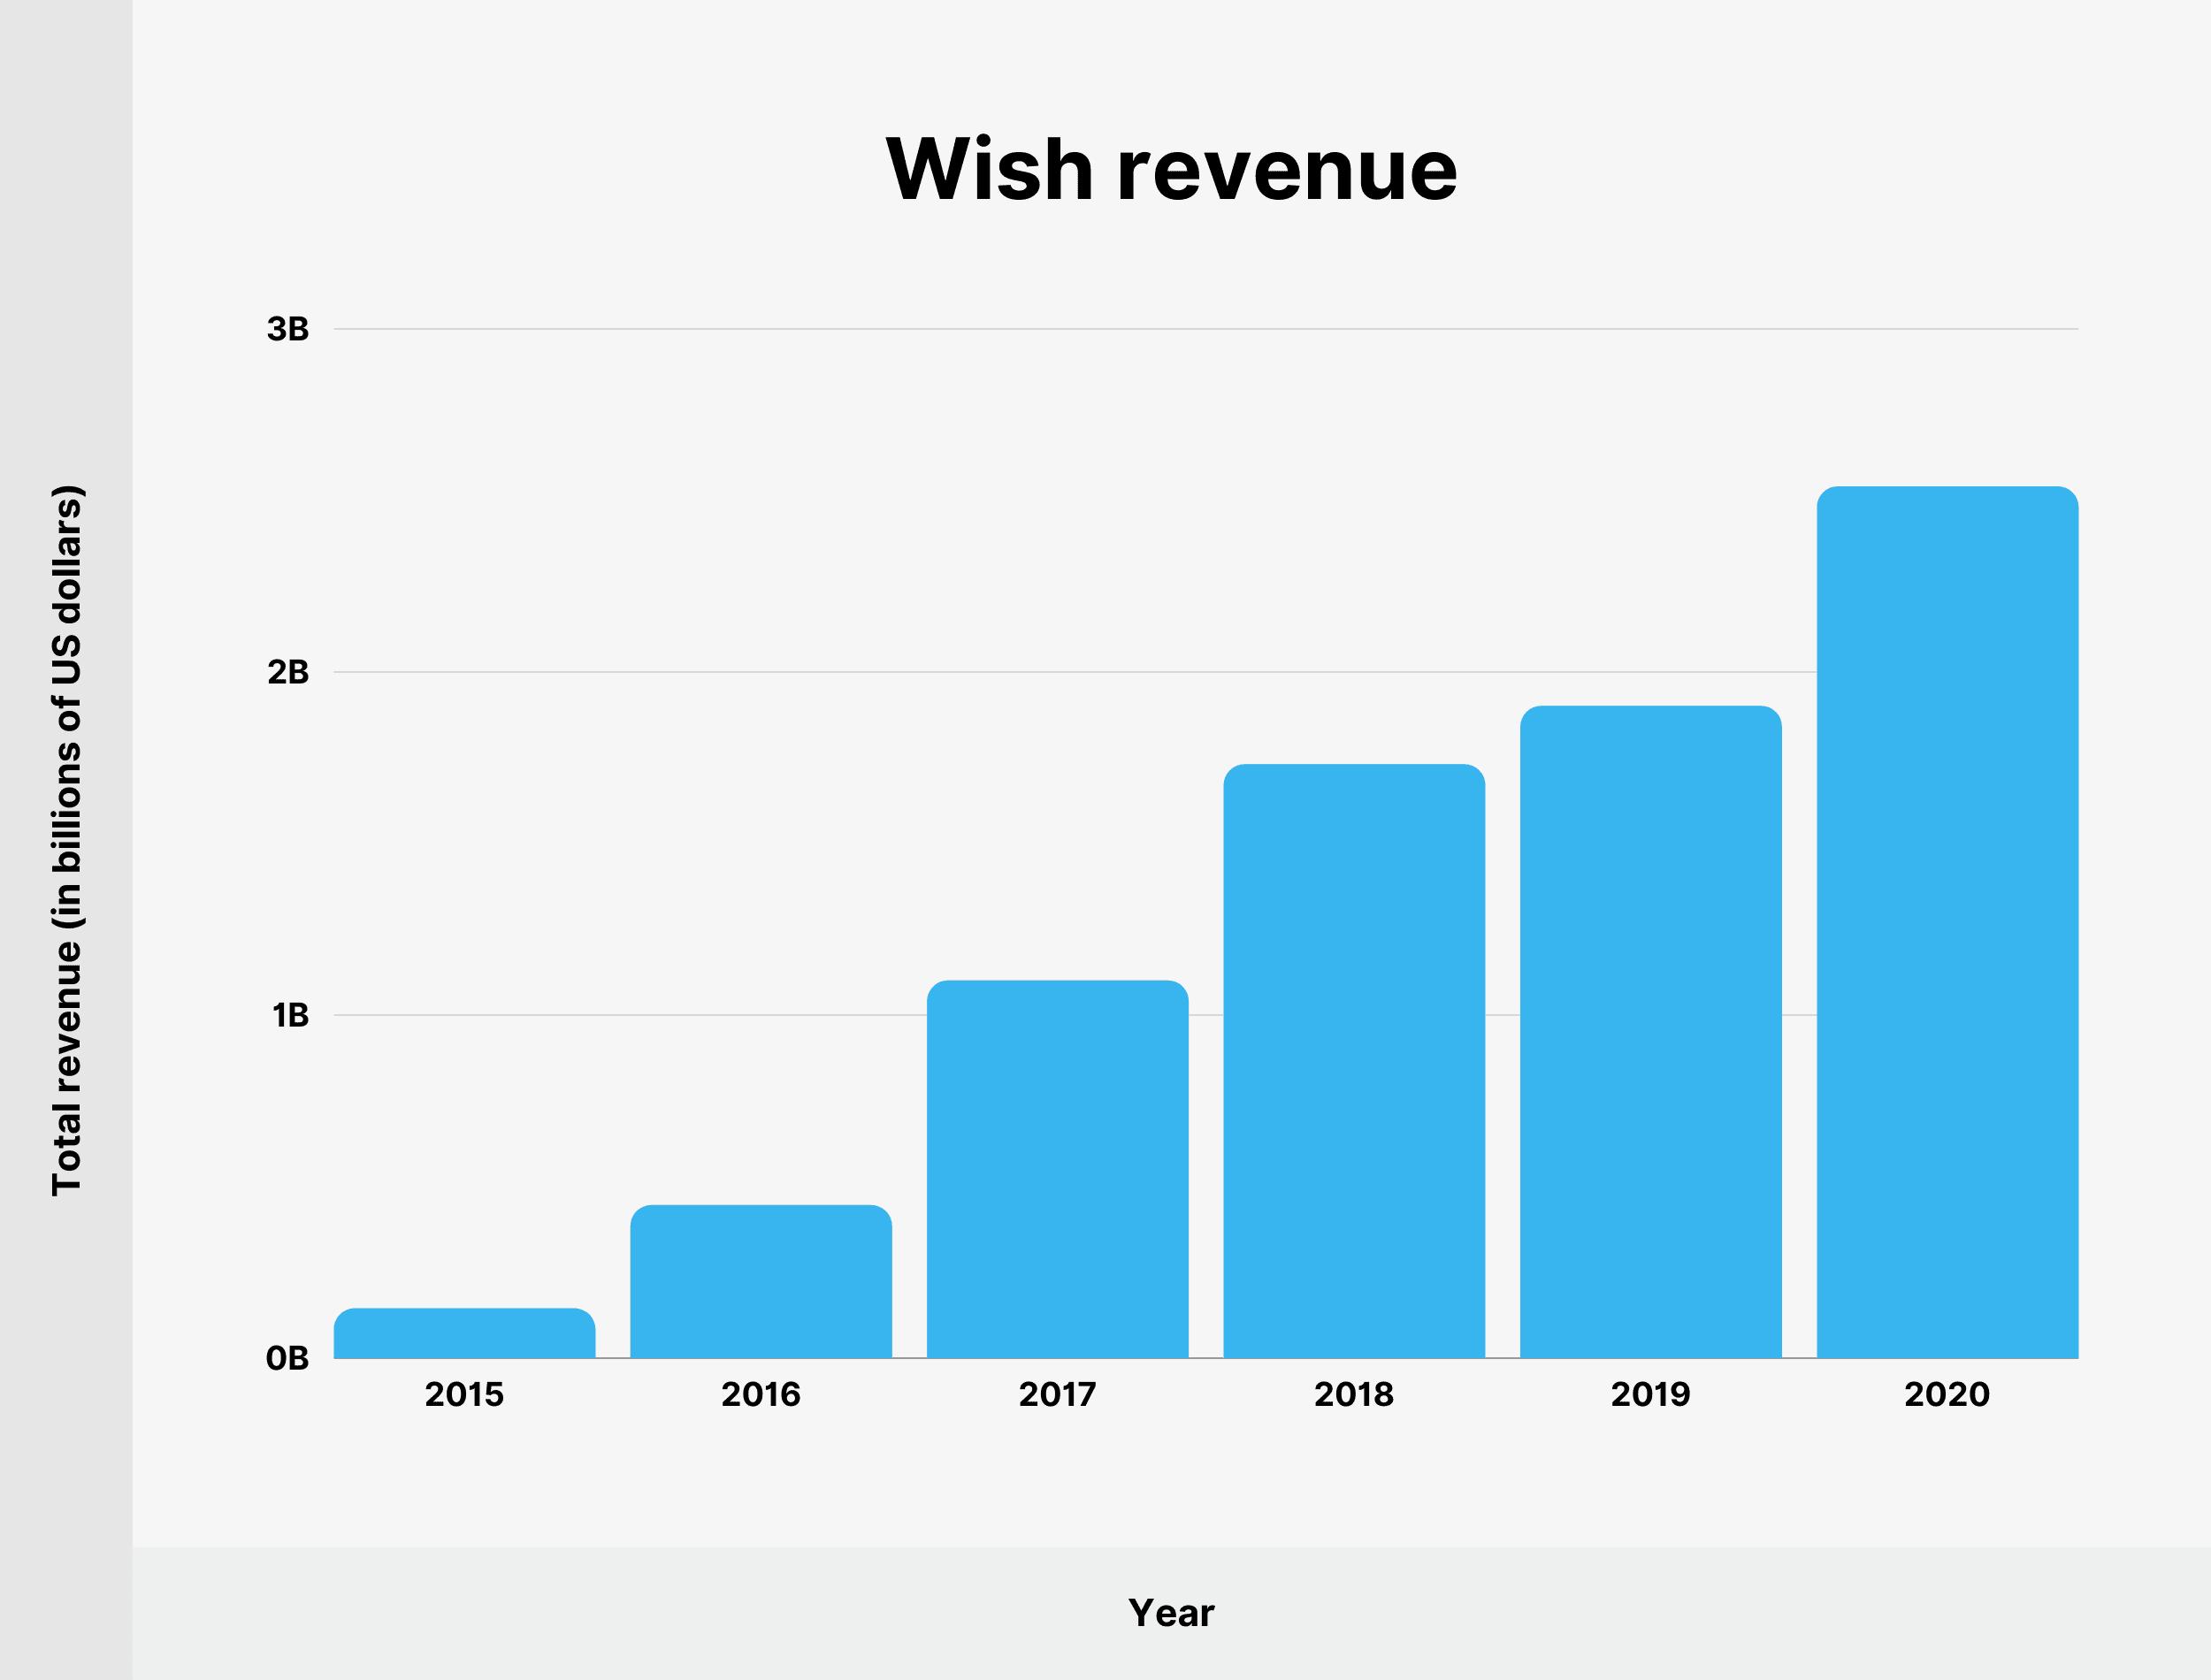 Wish revenue